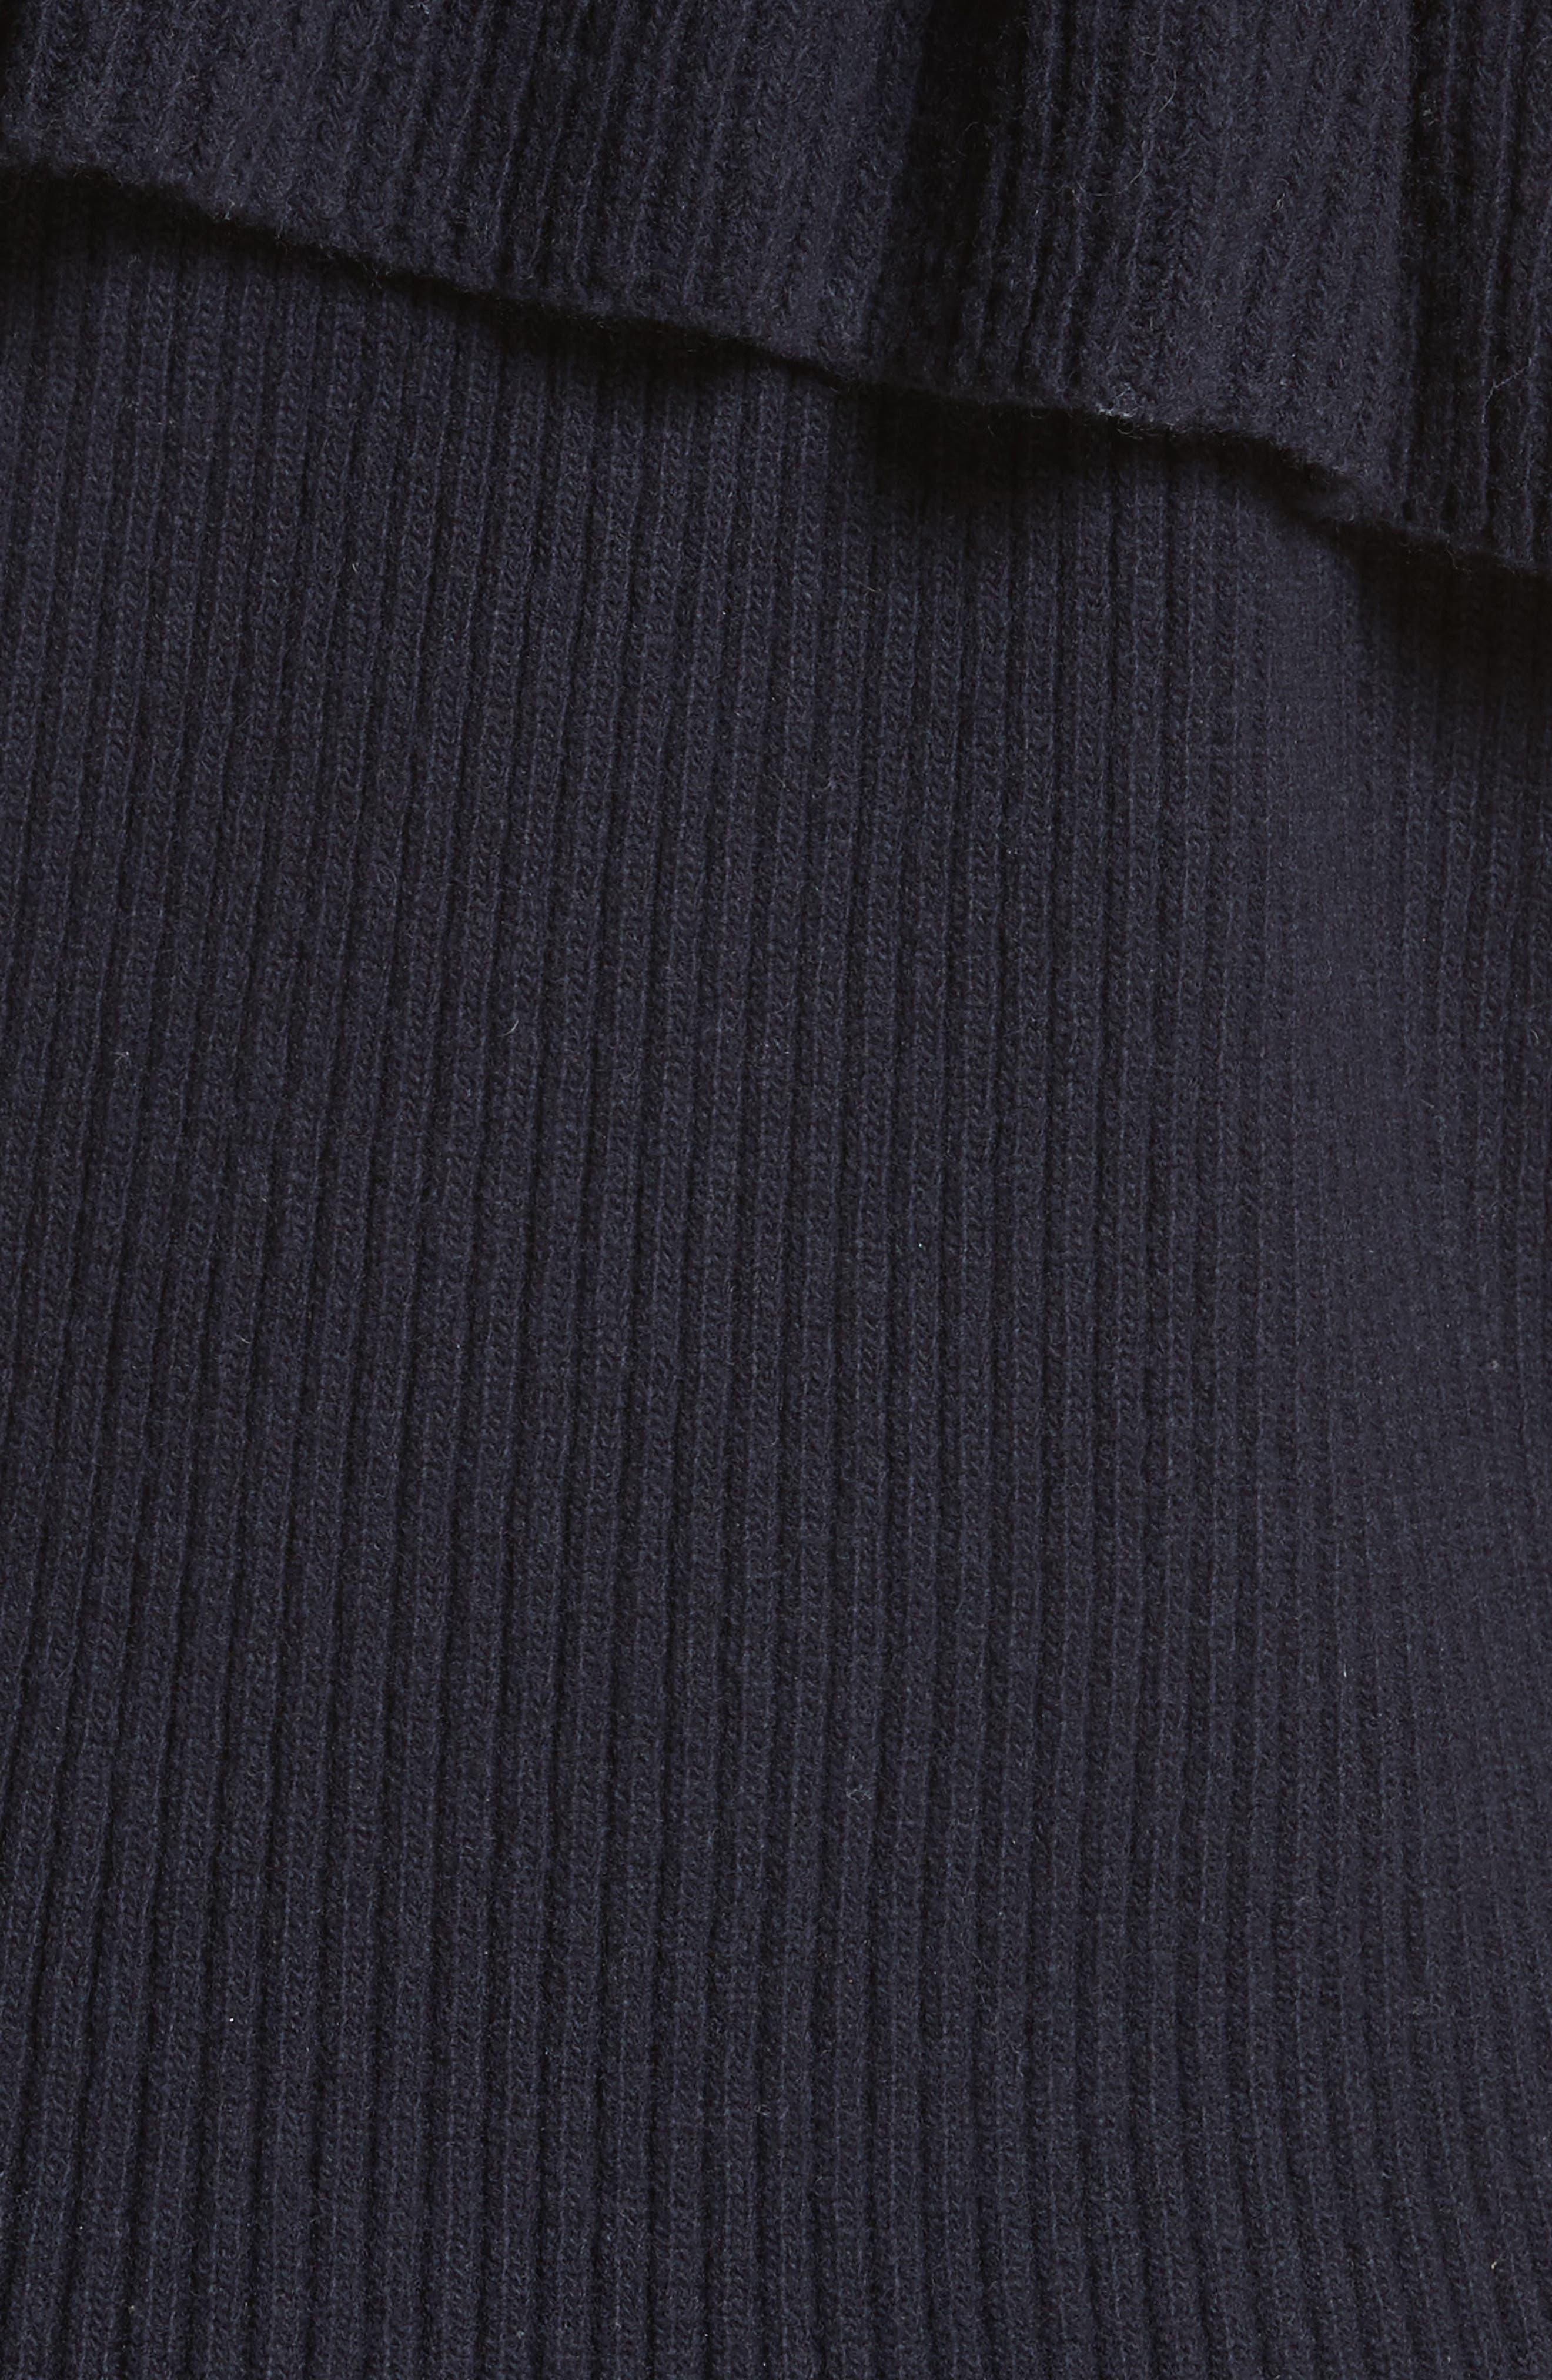 Asymmetrical Frill Illusion Sweater,                             Alternate thumbnail 5, color,                             Blue